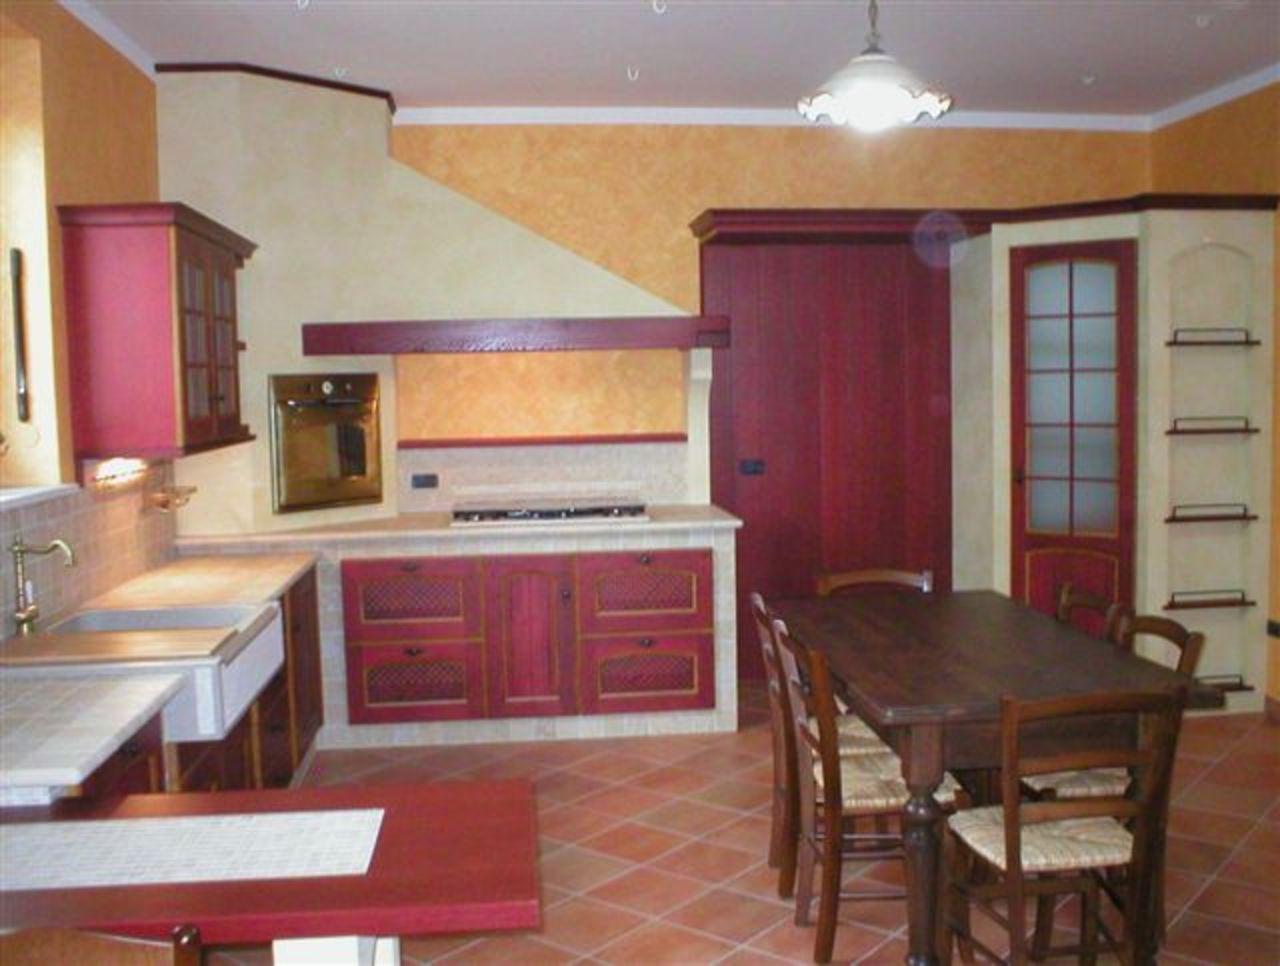 modelli di cucina in muratura - cucine moderne economiche - prezzi ...